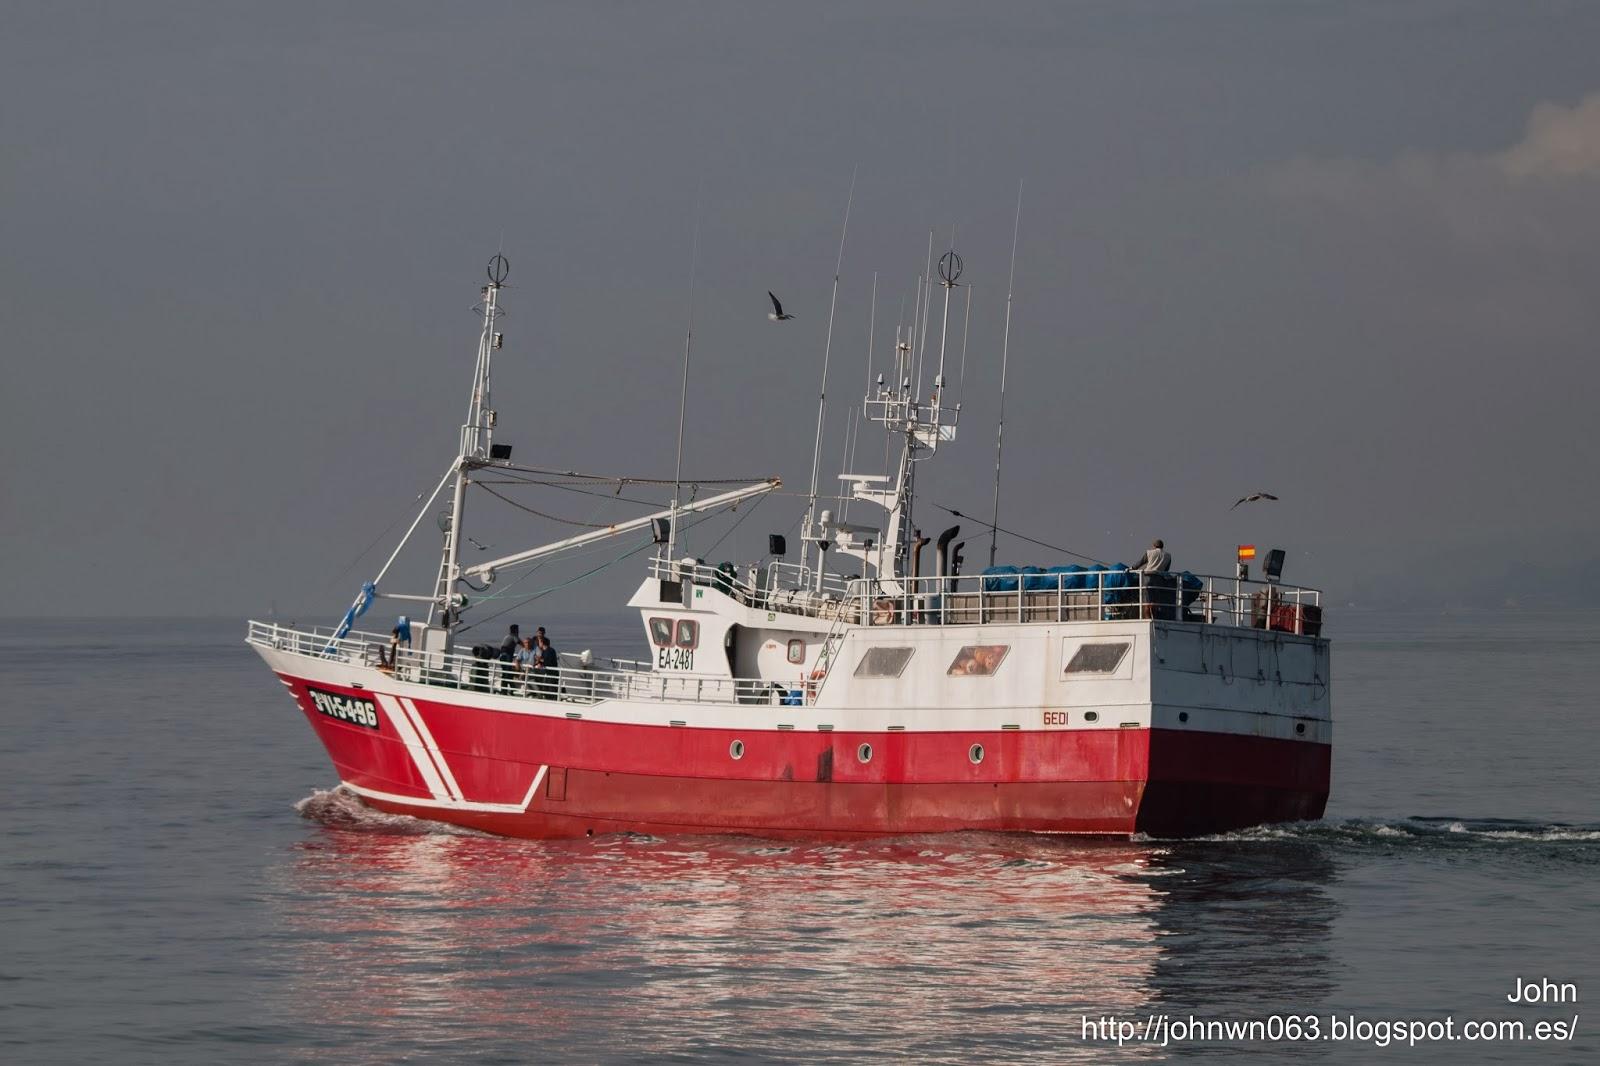 gedi, pesquero, vigo, fotos de barcos, a guarda